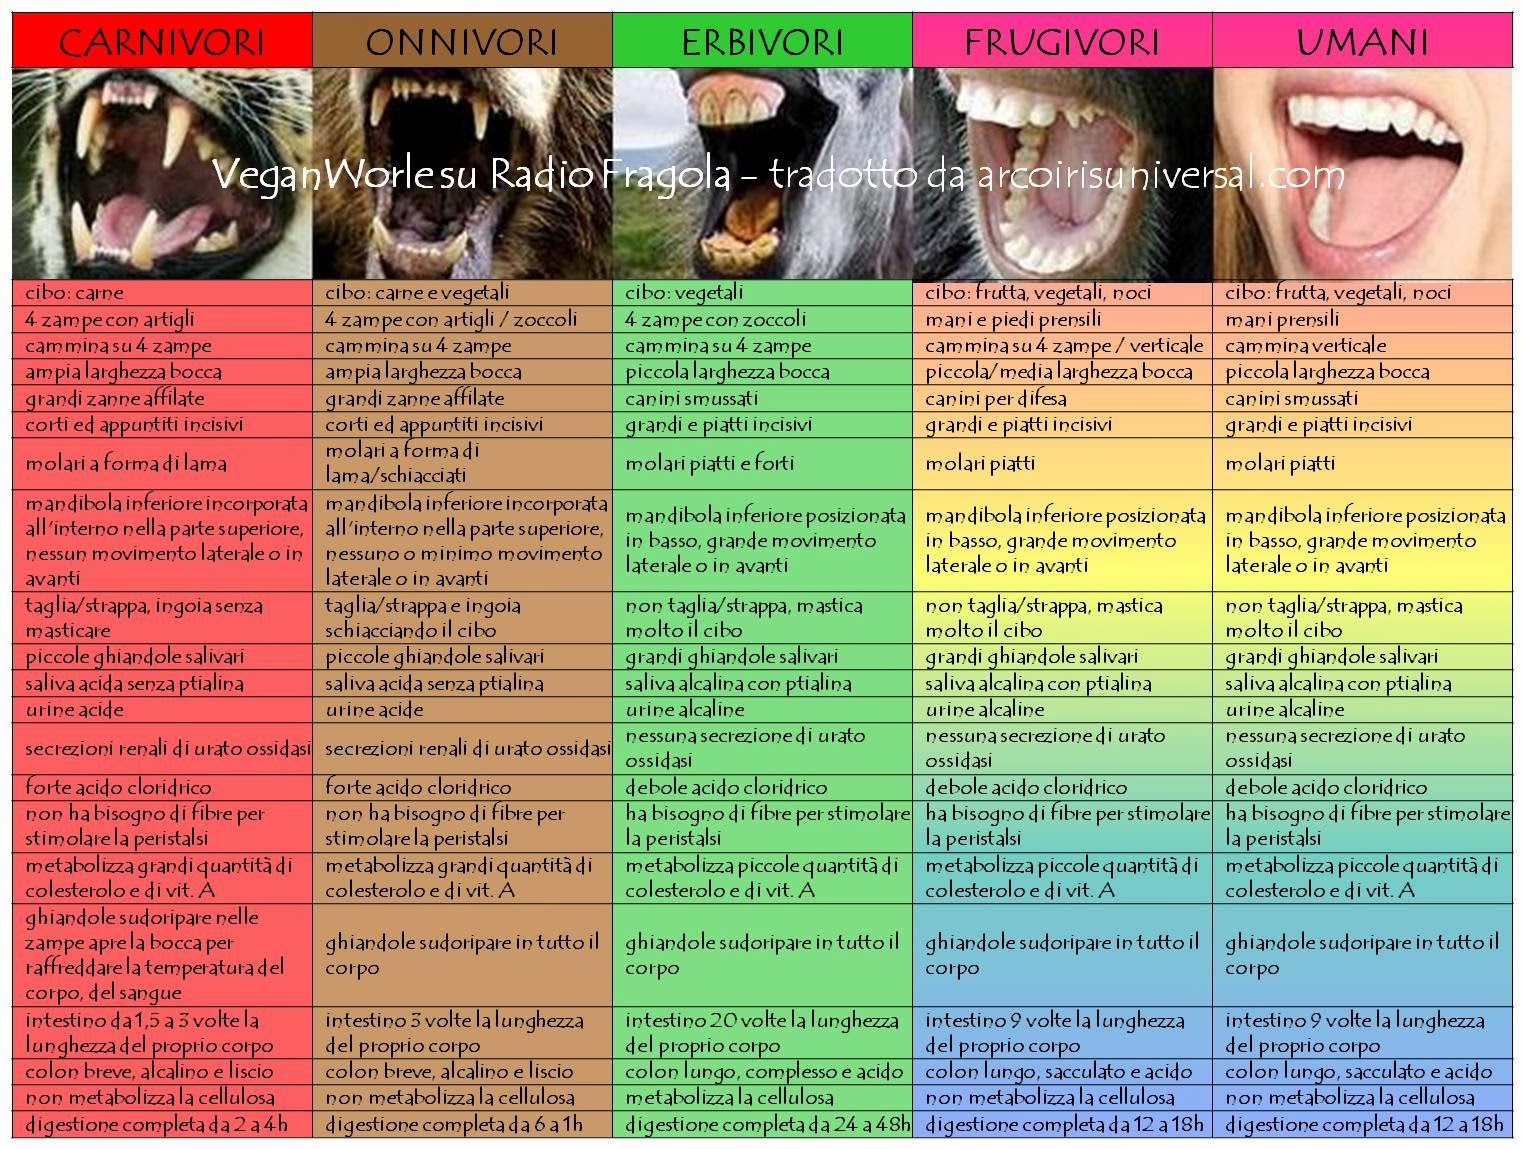 http://4.bp.blogspot.com/-01_EIPUqZmA/UxmszT6vw_I/AAAAAAAAAak/FCpOHnEus58/s1600/Anatomia+comparata2.jpg